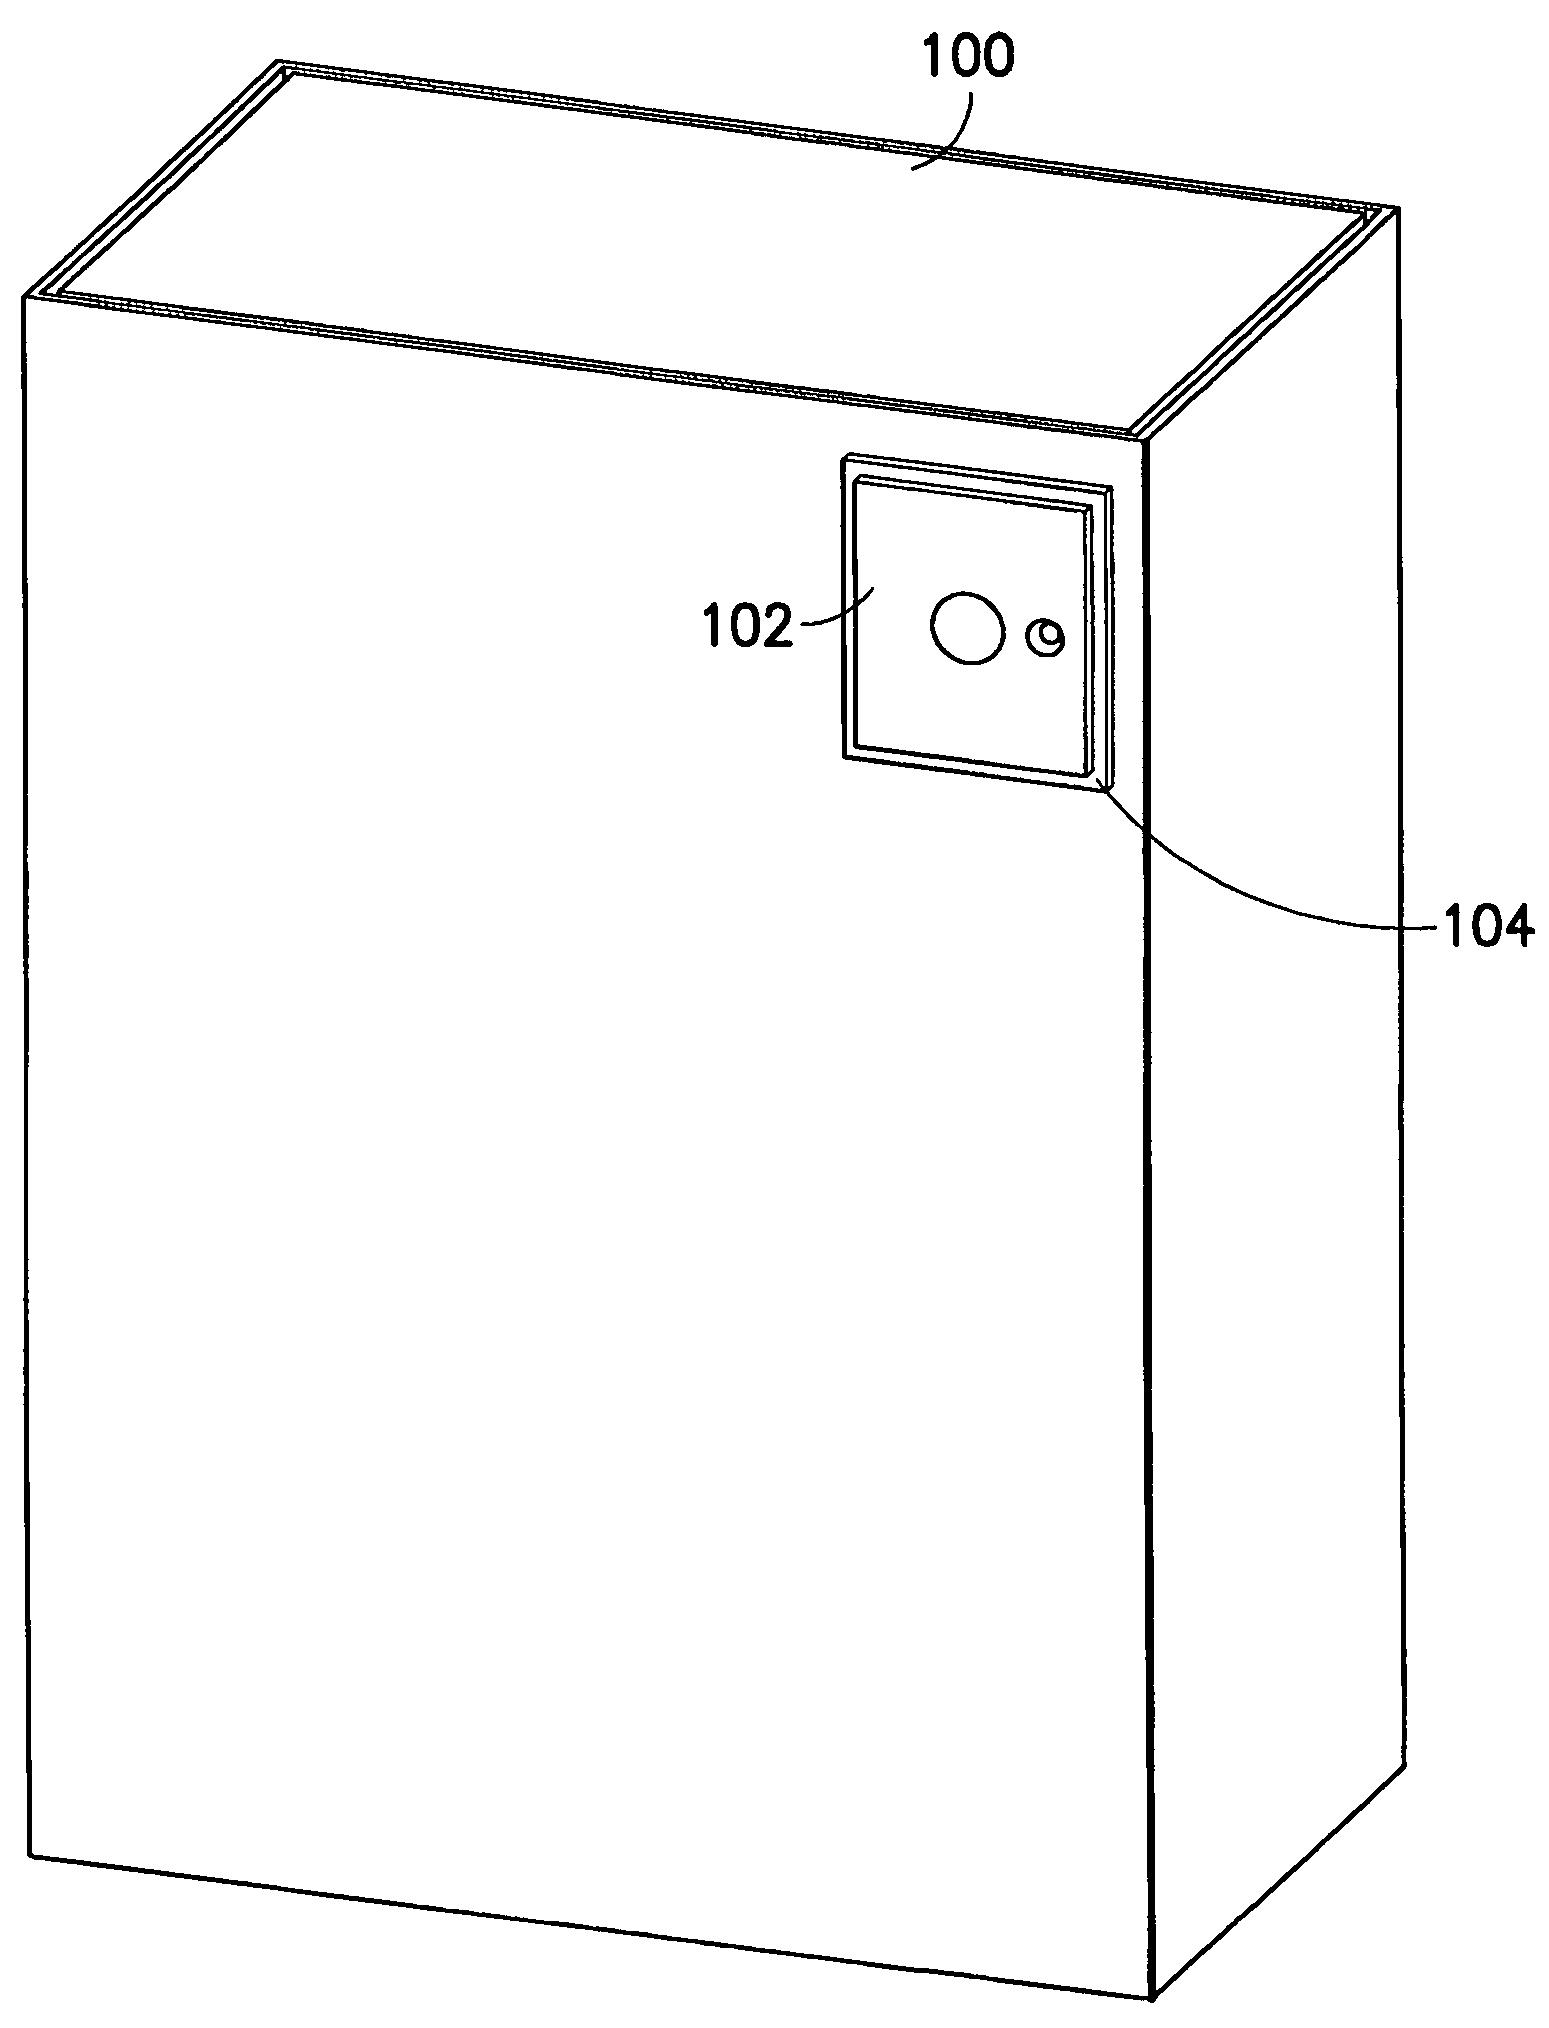 Patent US 7,671,741 B2